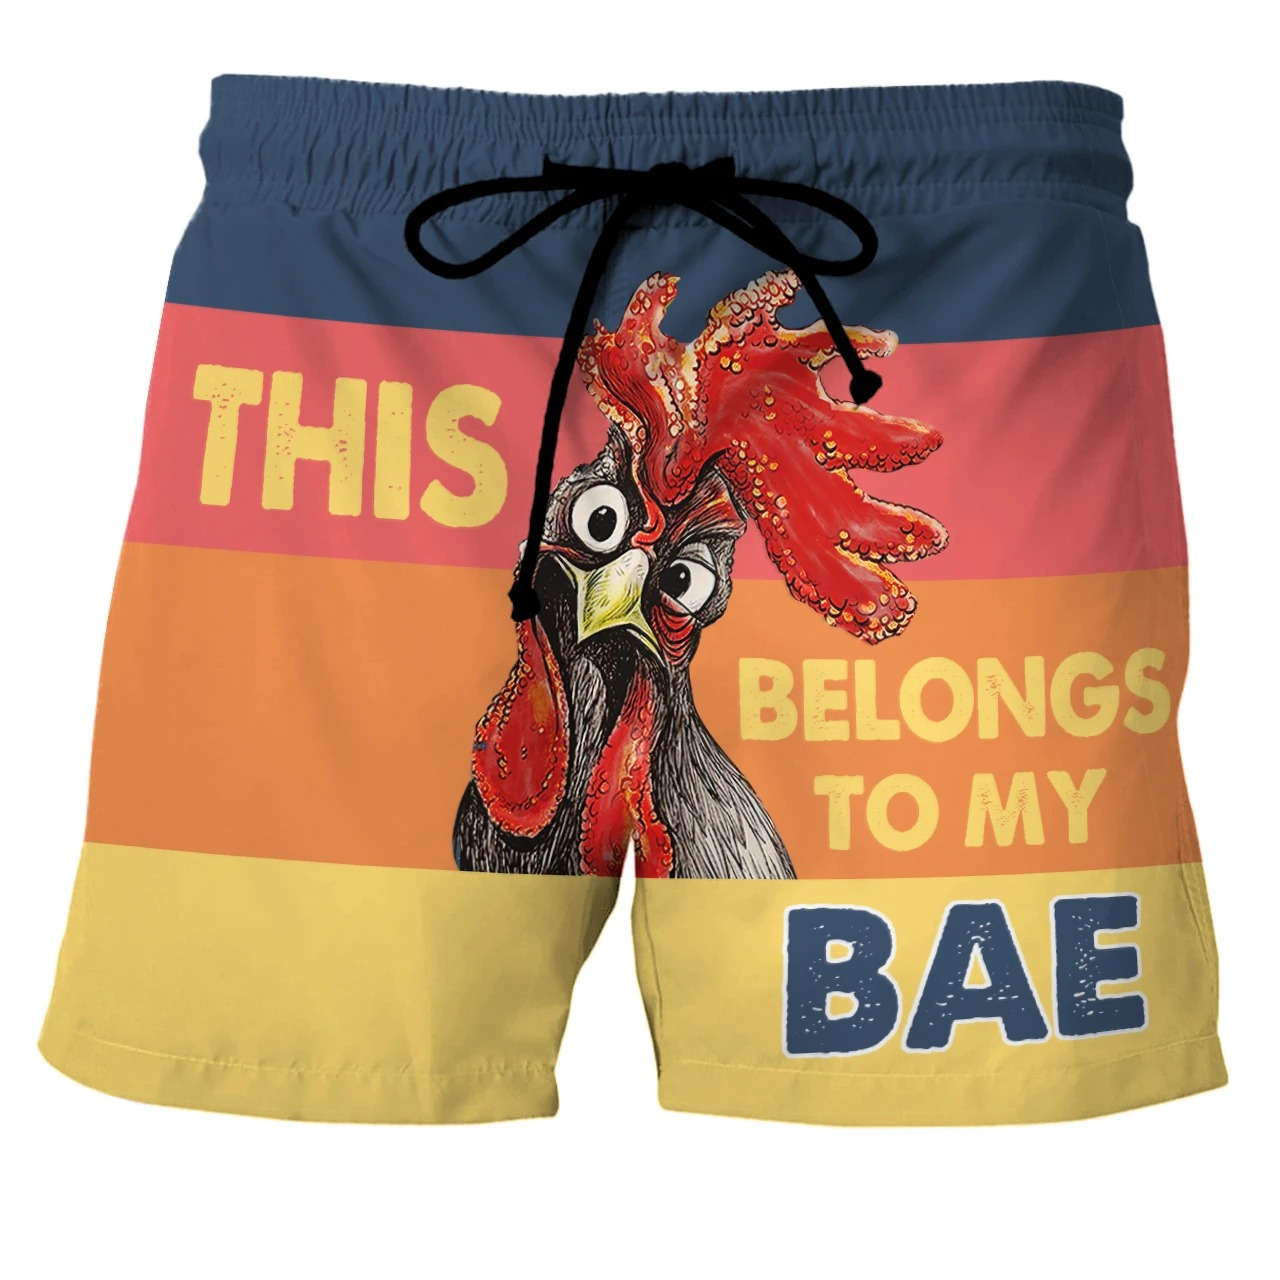 This cock belongs to my bae beach shorts